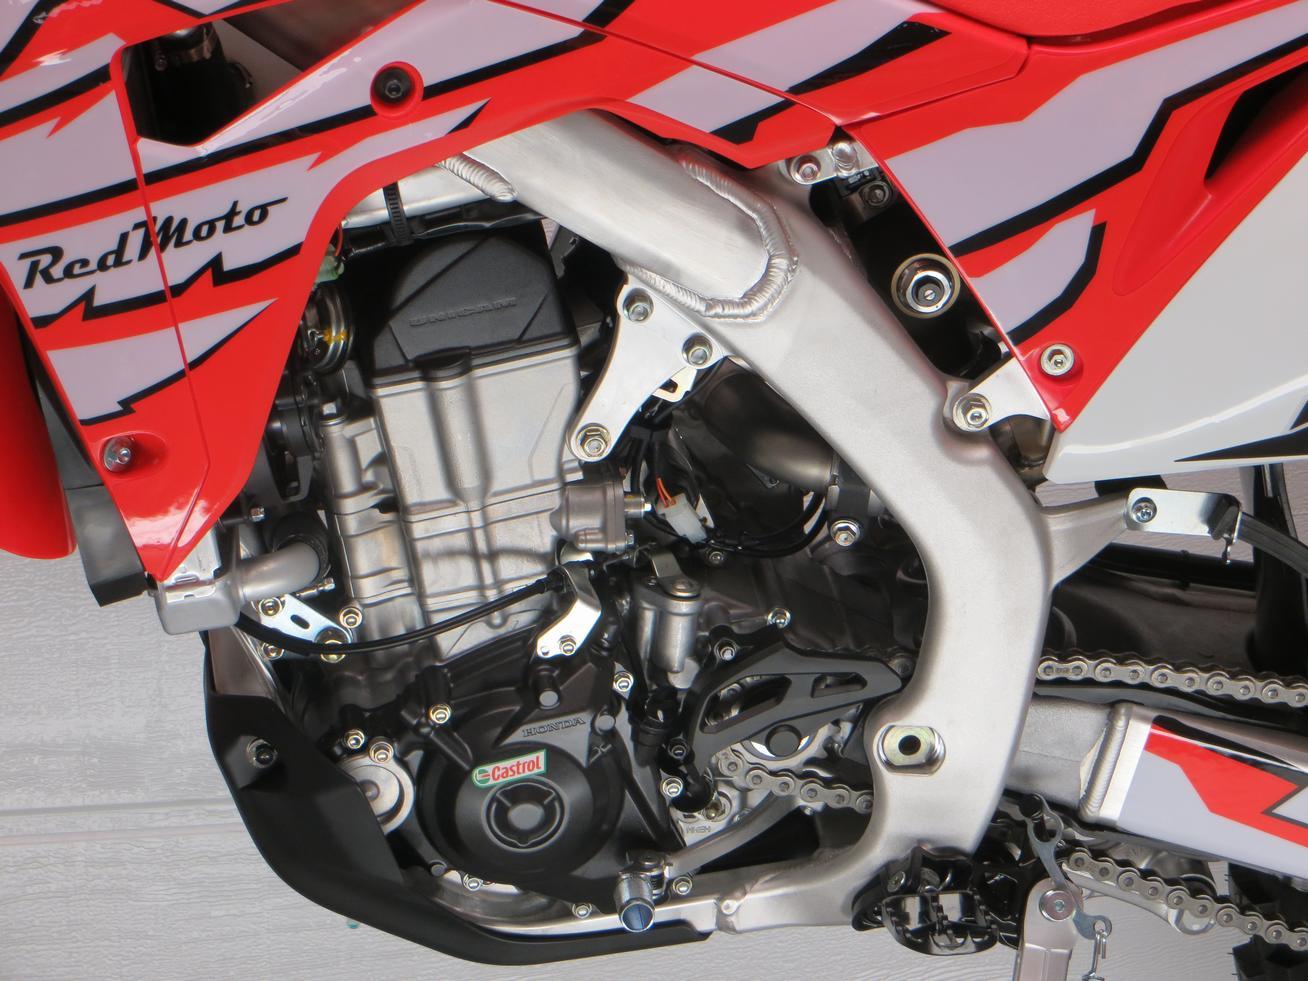 HONDA - CRF 400 RXK ENDURO